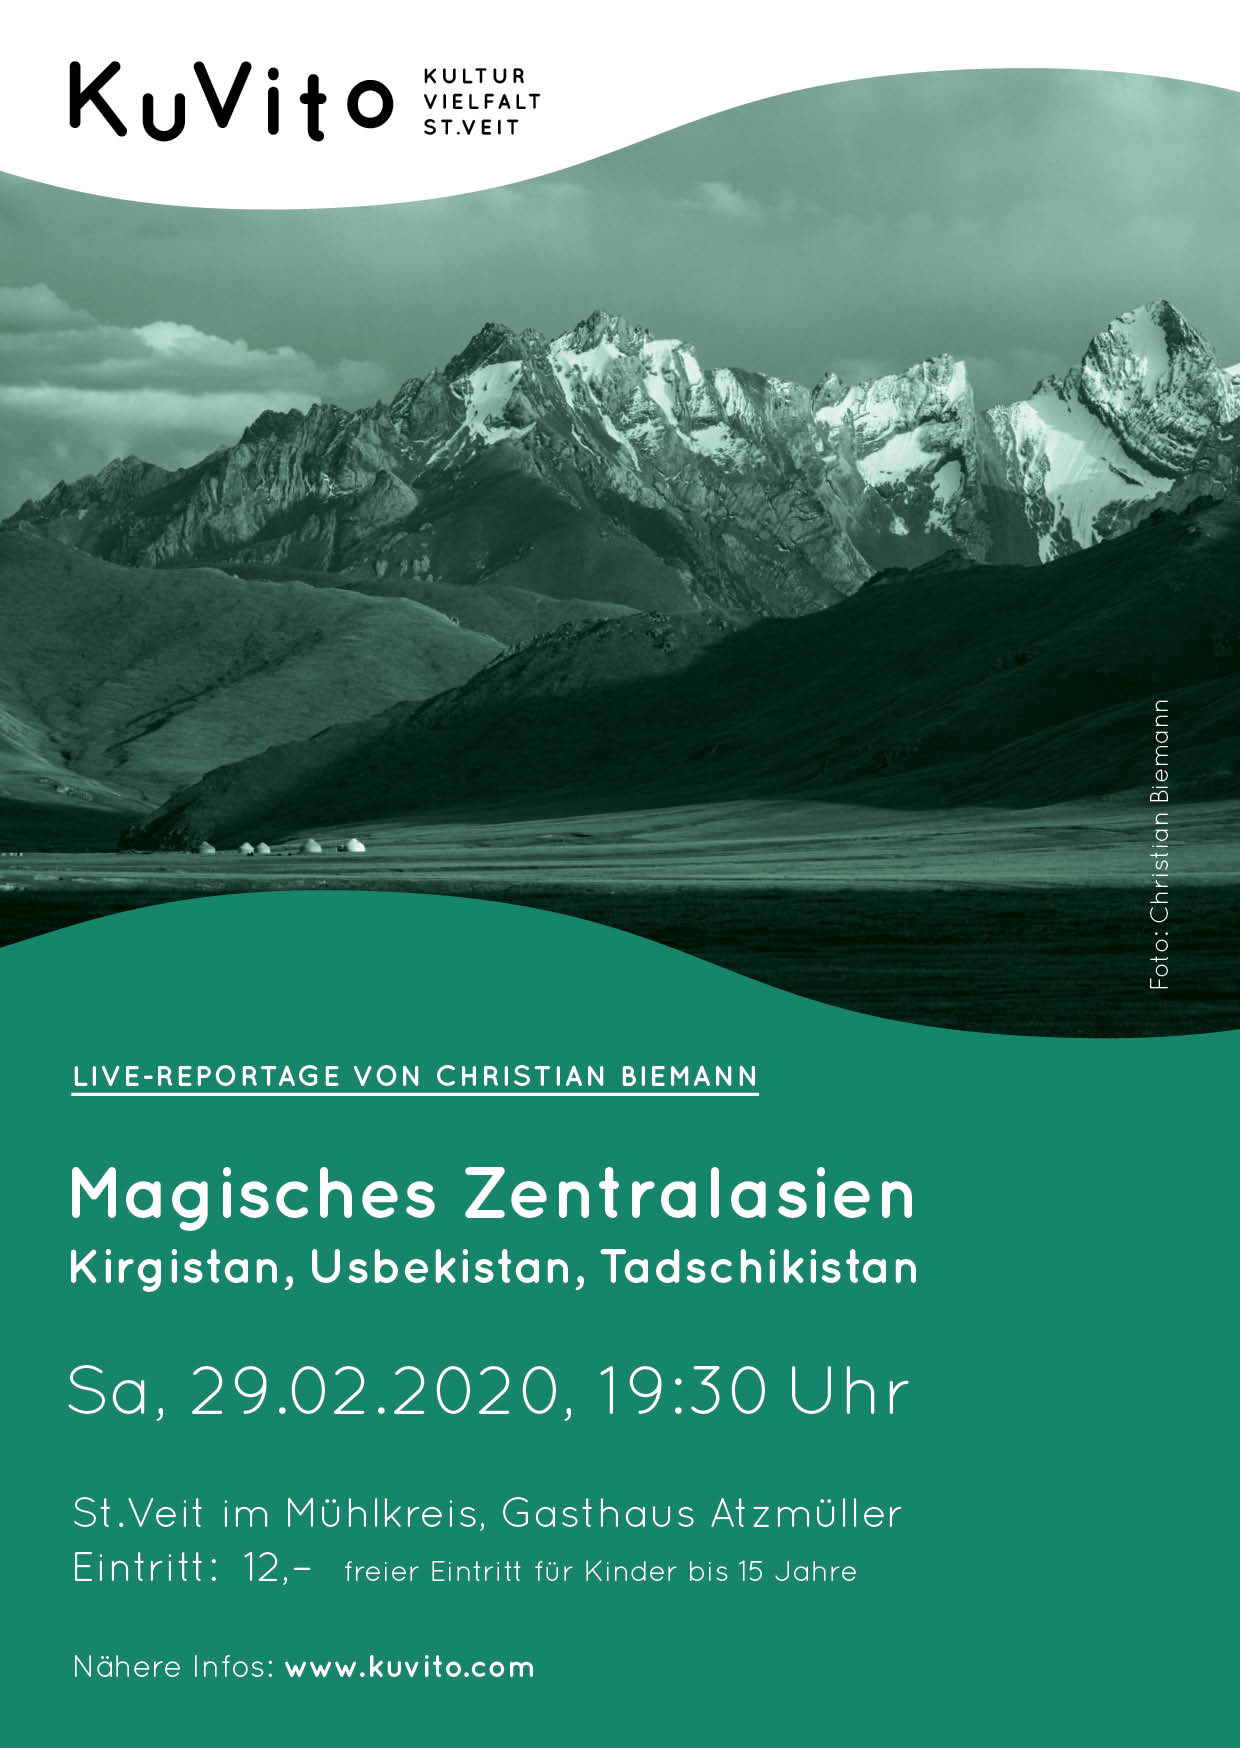 200205_Reisebericht_Flyer_RZ